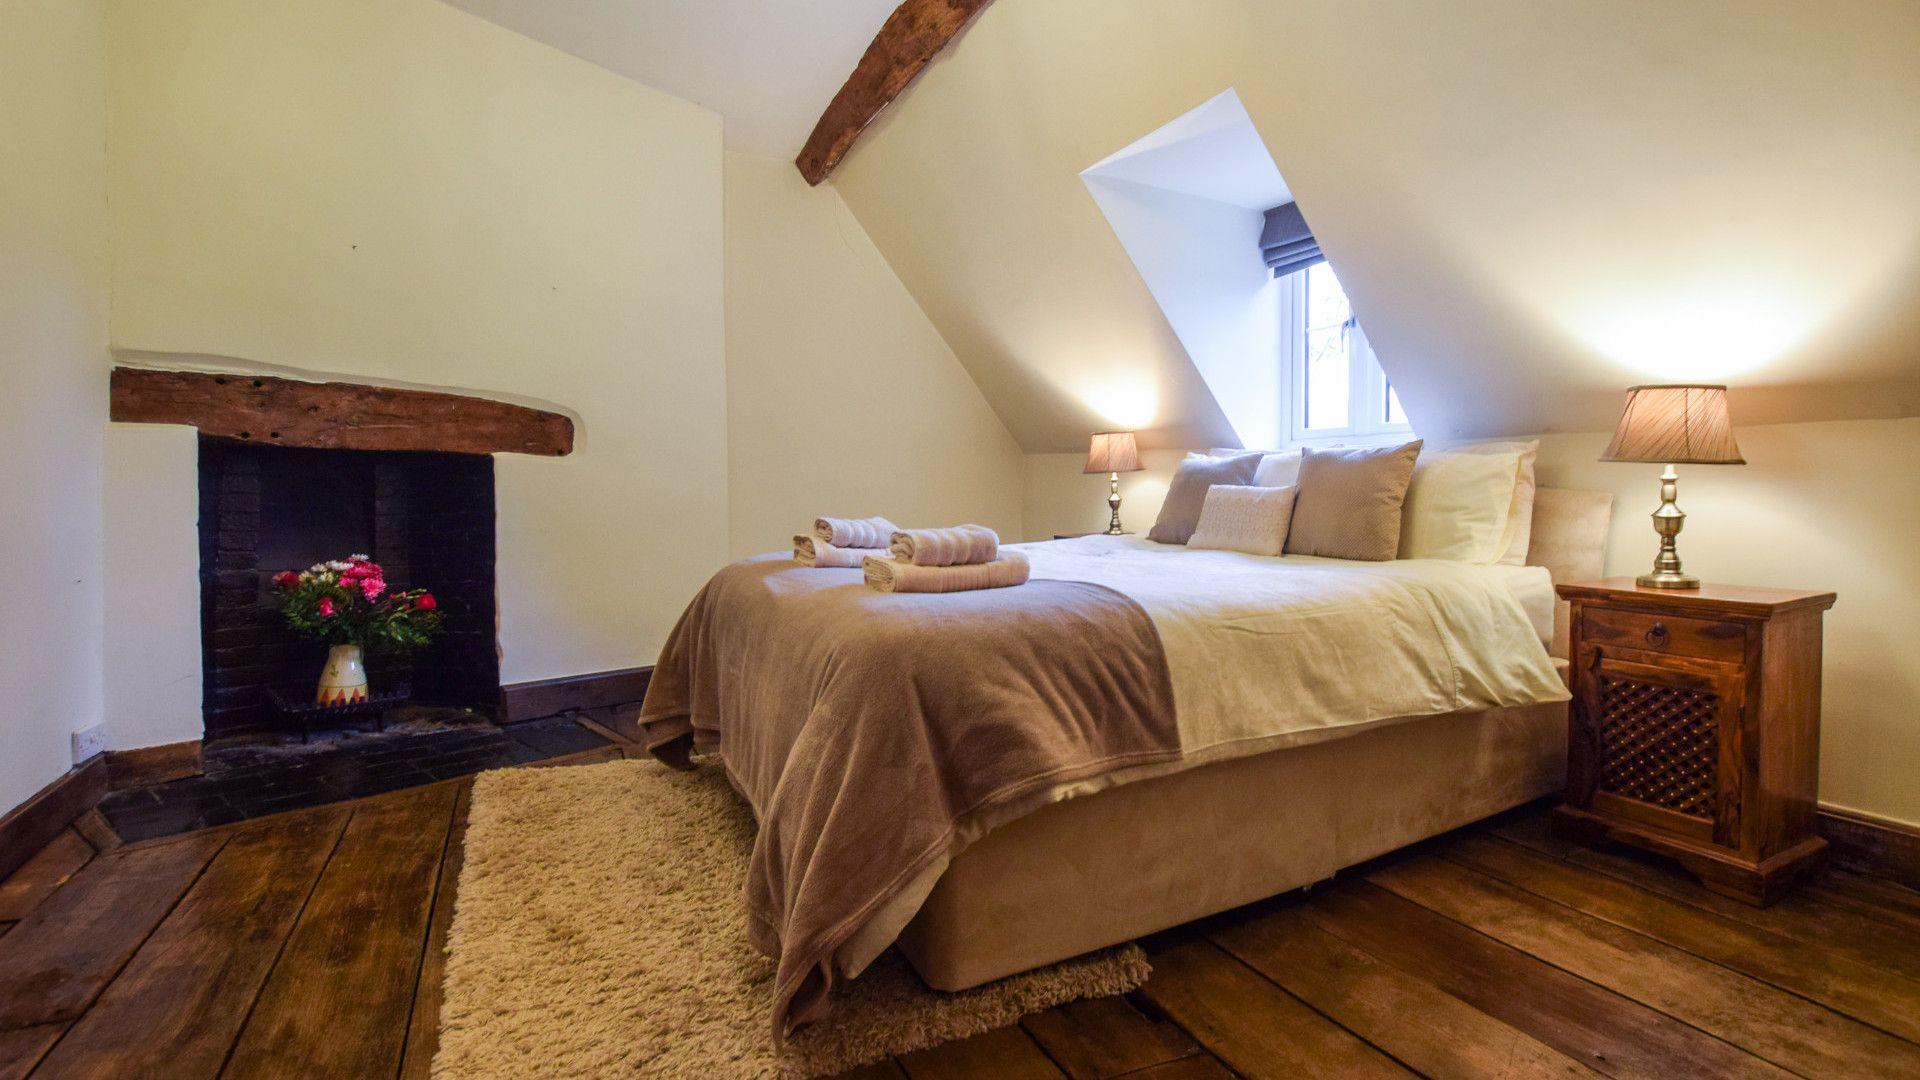 Bedroom 4, Landers, BoltholeRetreats